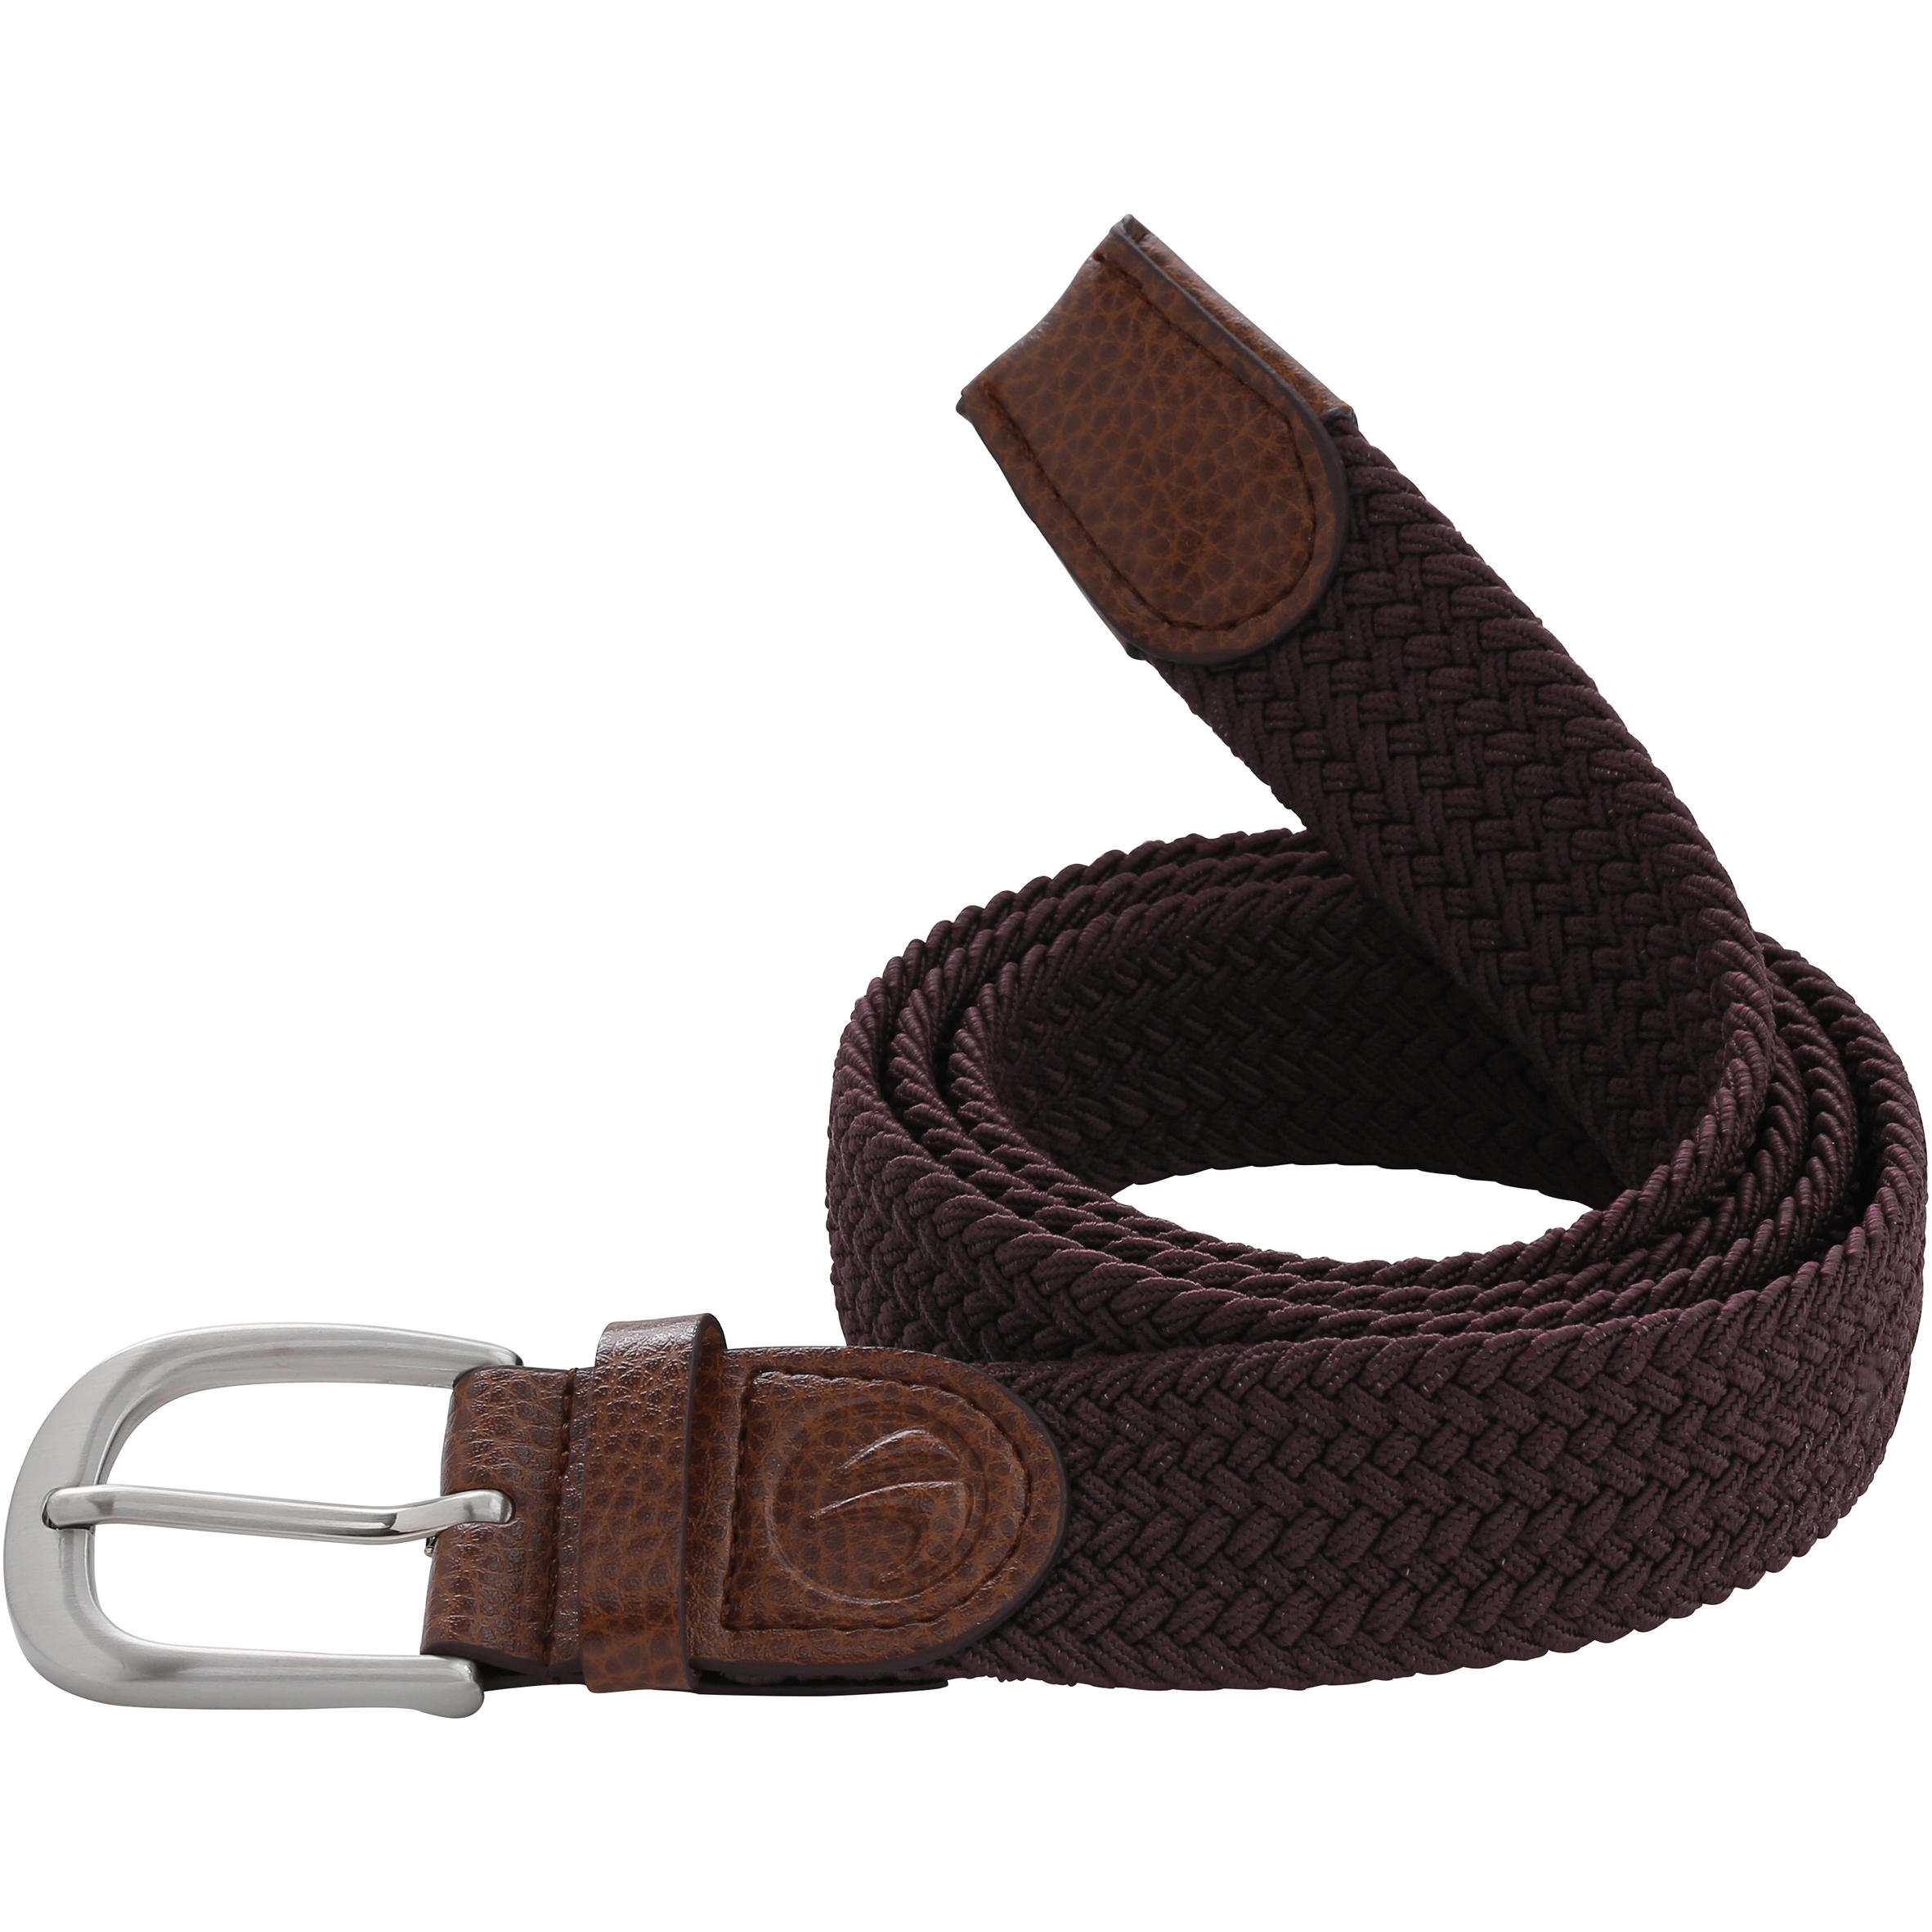 Cinturón de golf extensible adulto burdeos talla 1